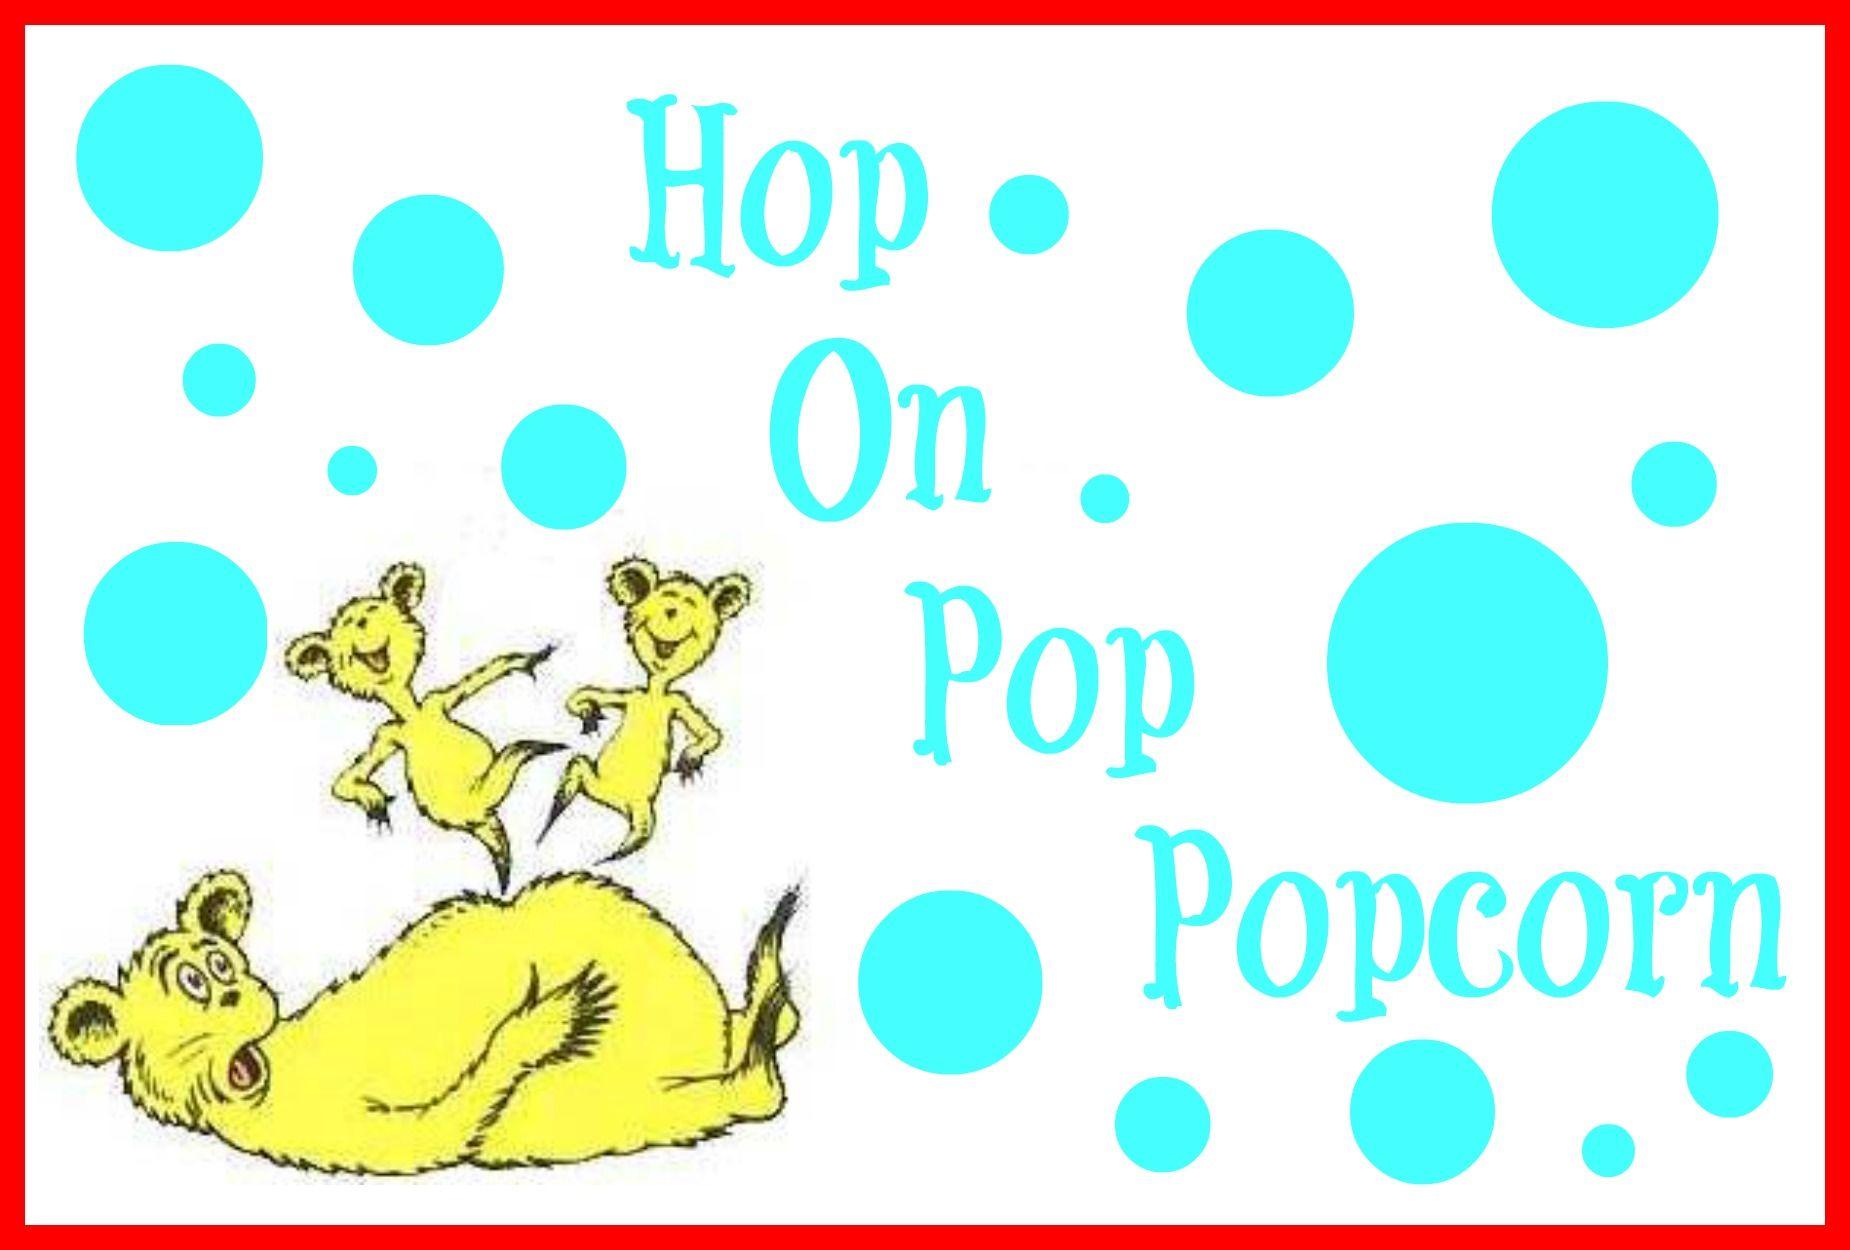 Pin by Jennifer Alfi on Dr. Seuss | Hop on pop, Dr seuss ...